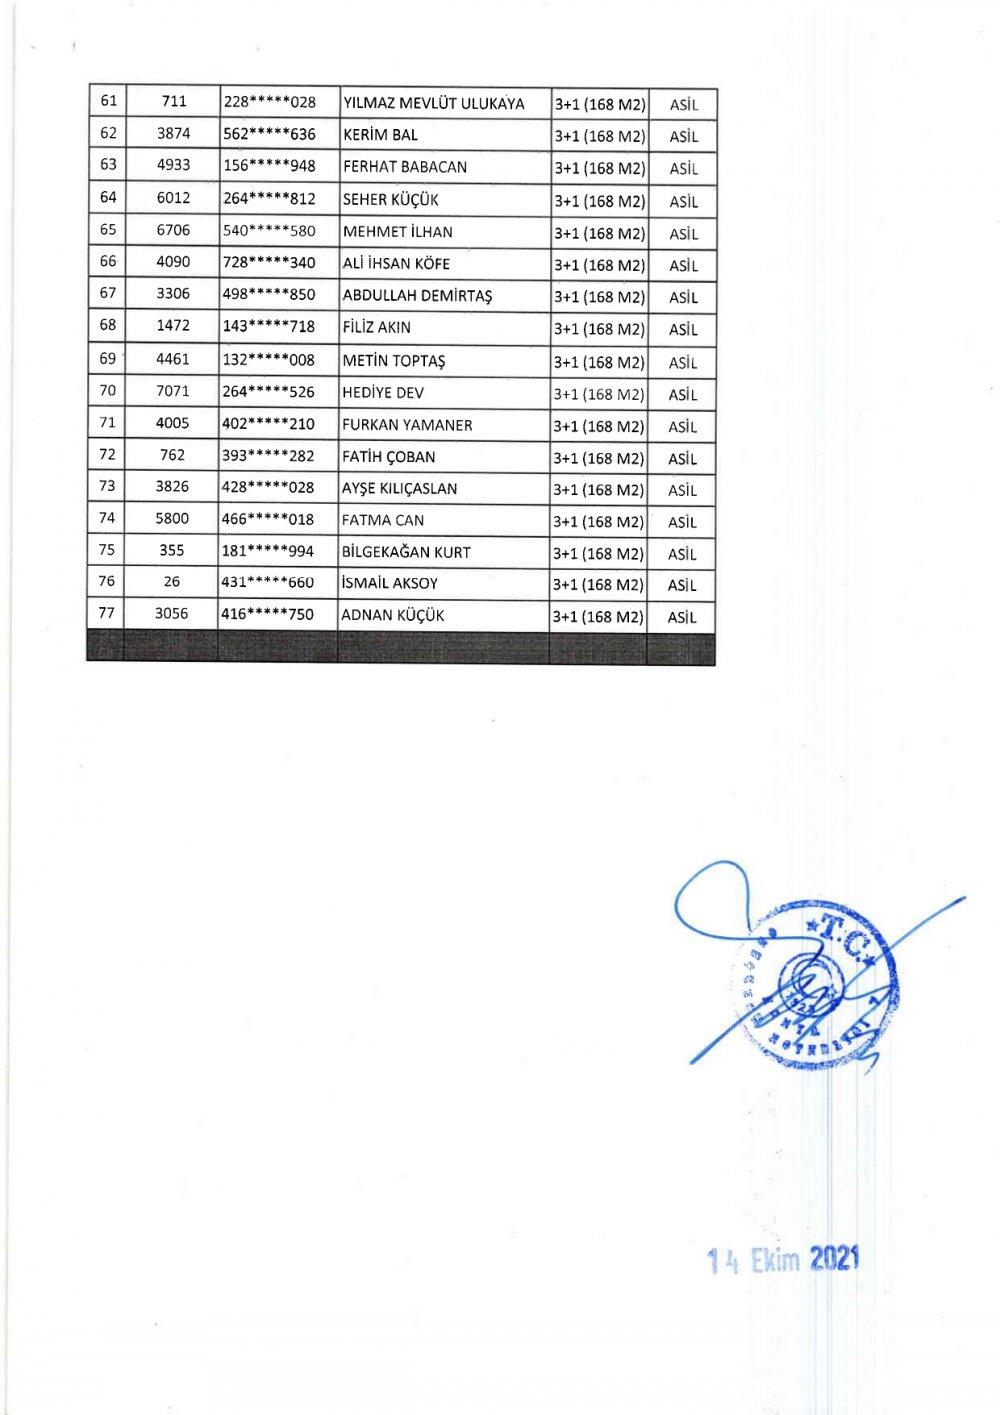 ss-turgutreis-evleri-kyk-kura-cekilis-listesi-page-0014.jpg